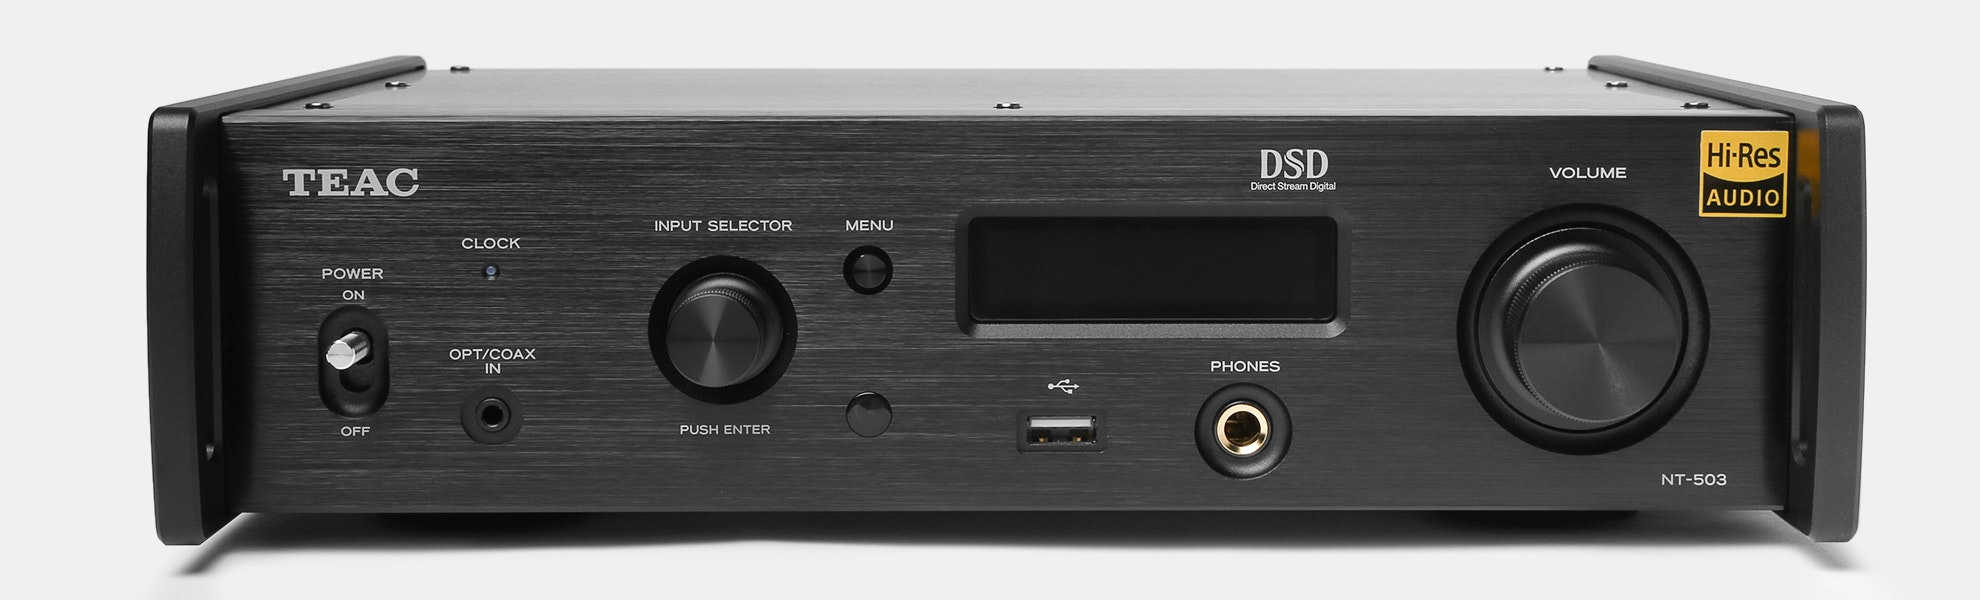 TEAC NT-503 USB DAC & Network Player